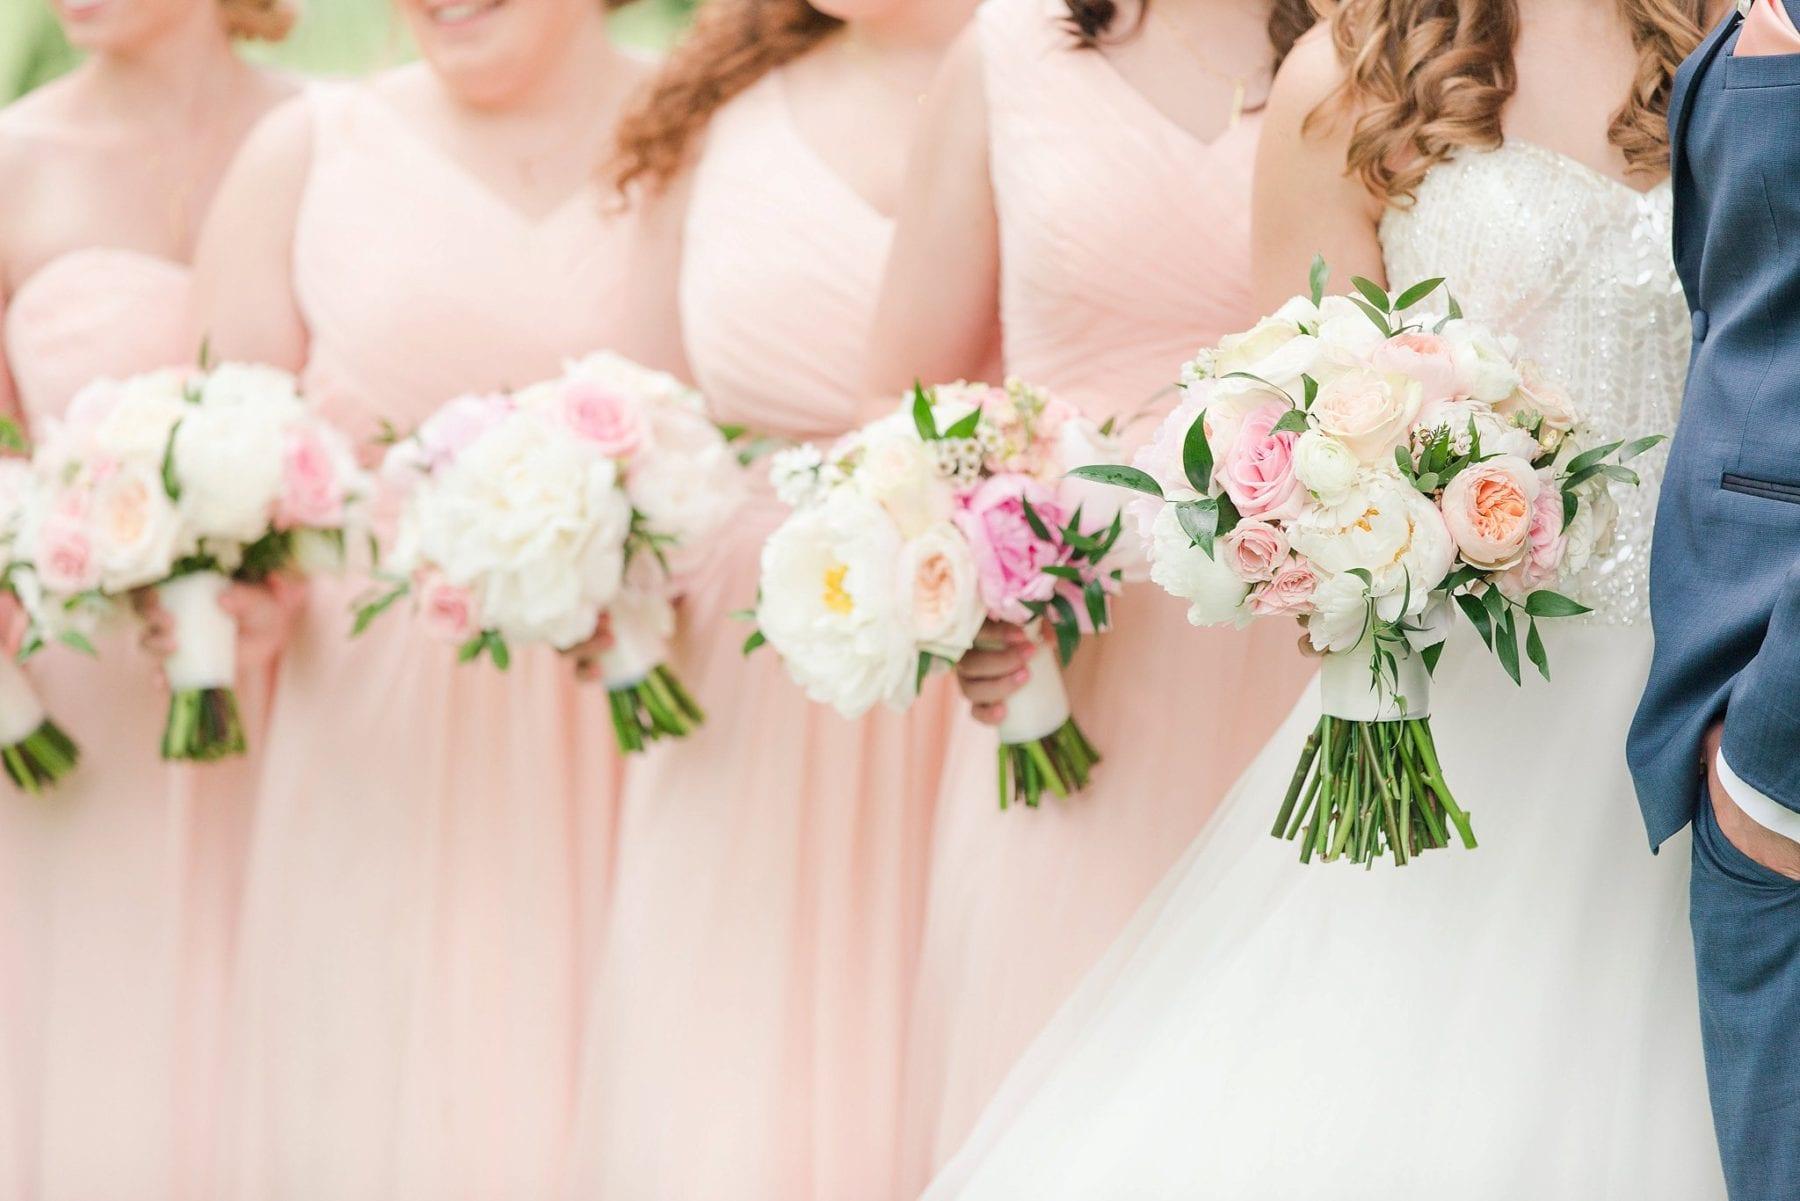 Justin & Megan Big Spring Farm Wedding Photos-145.jpg